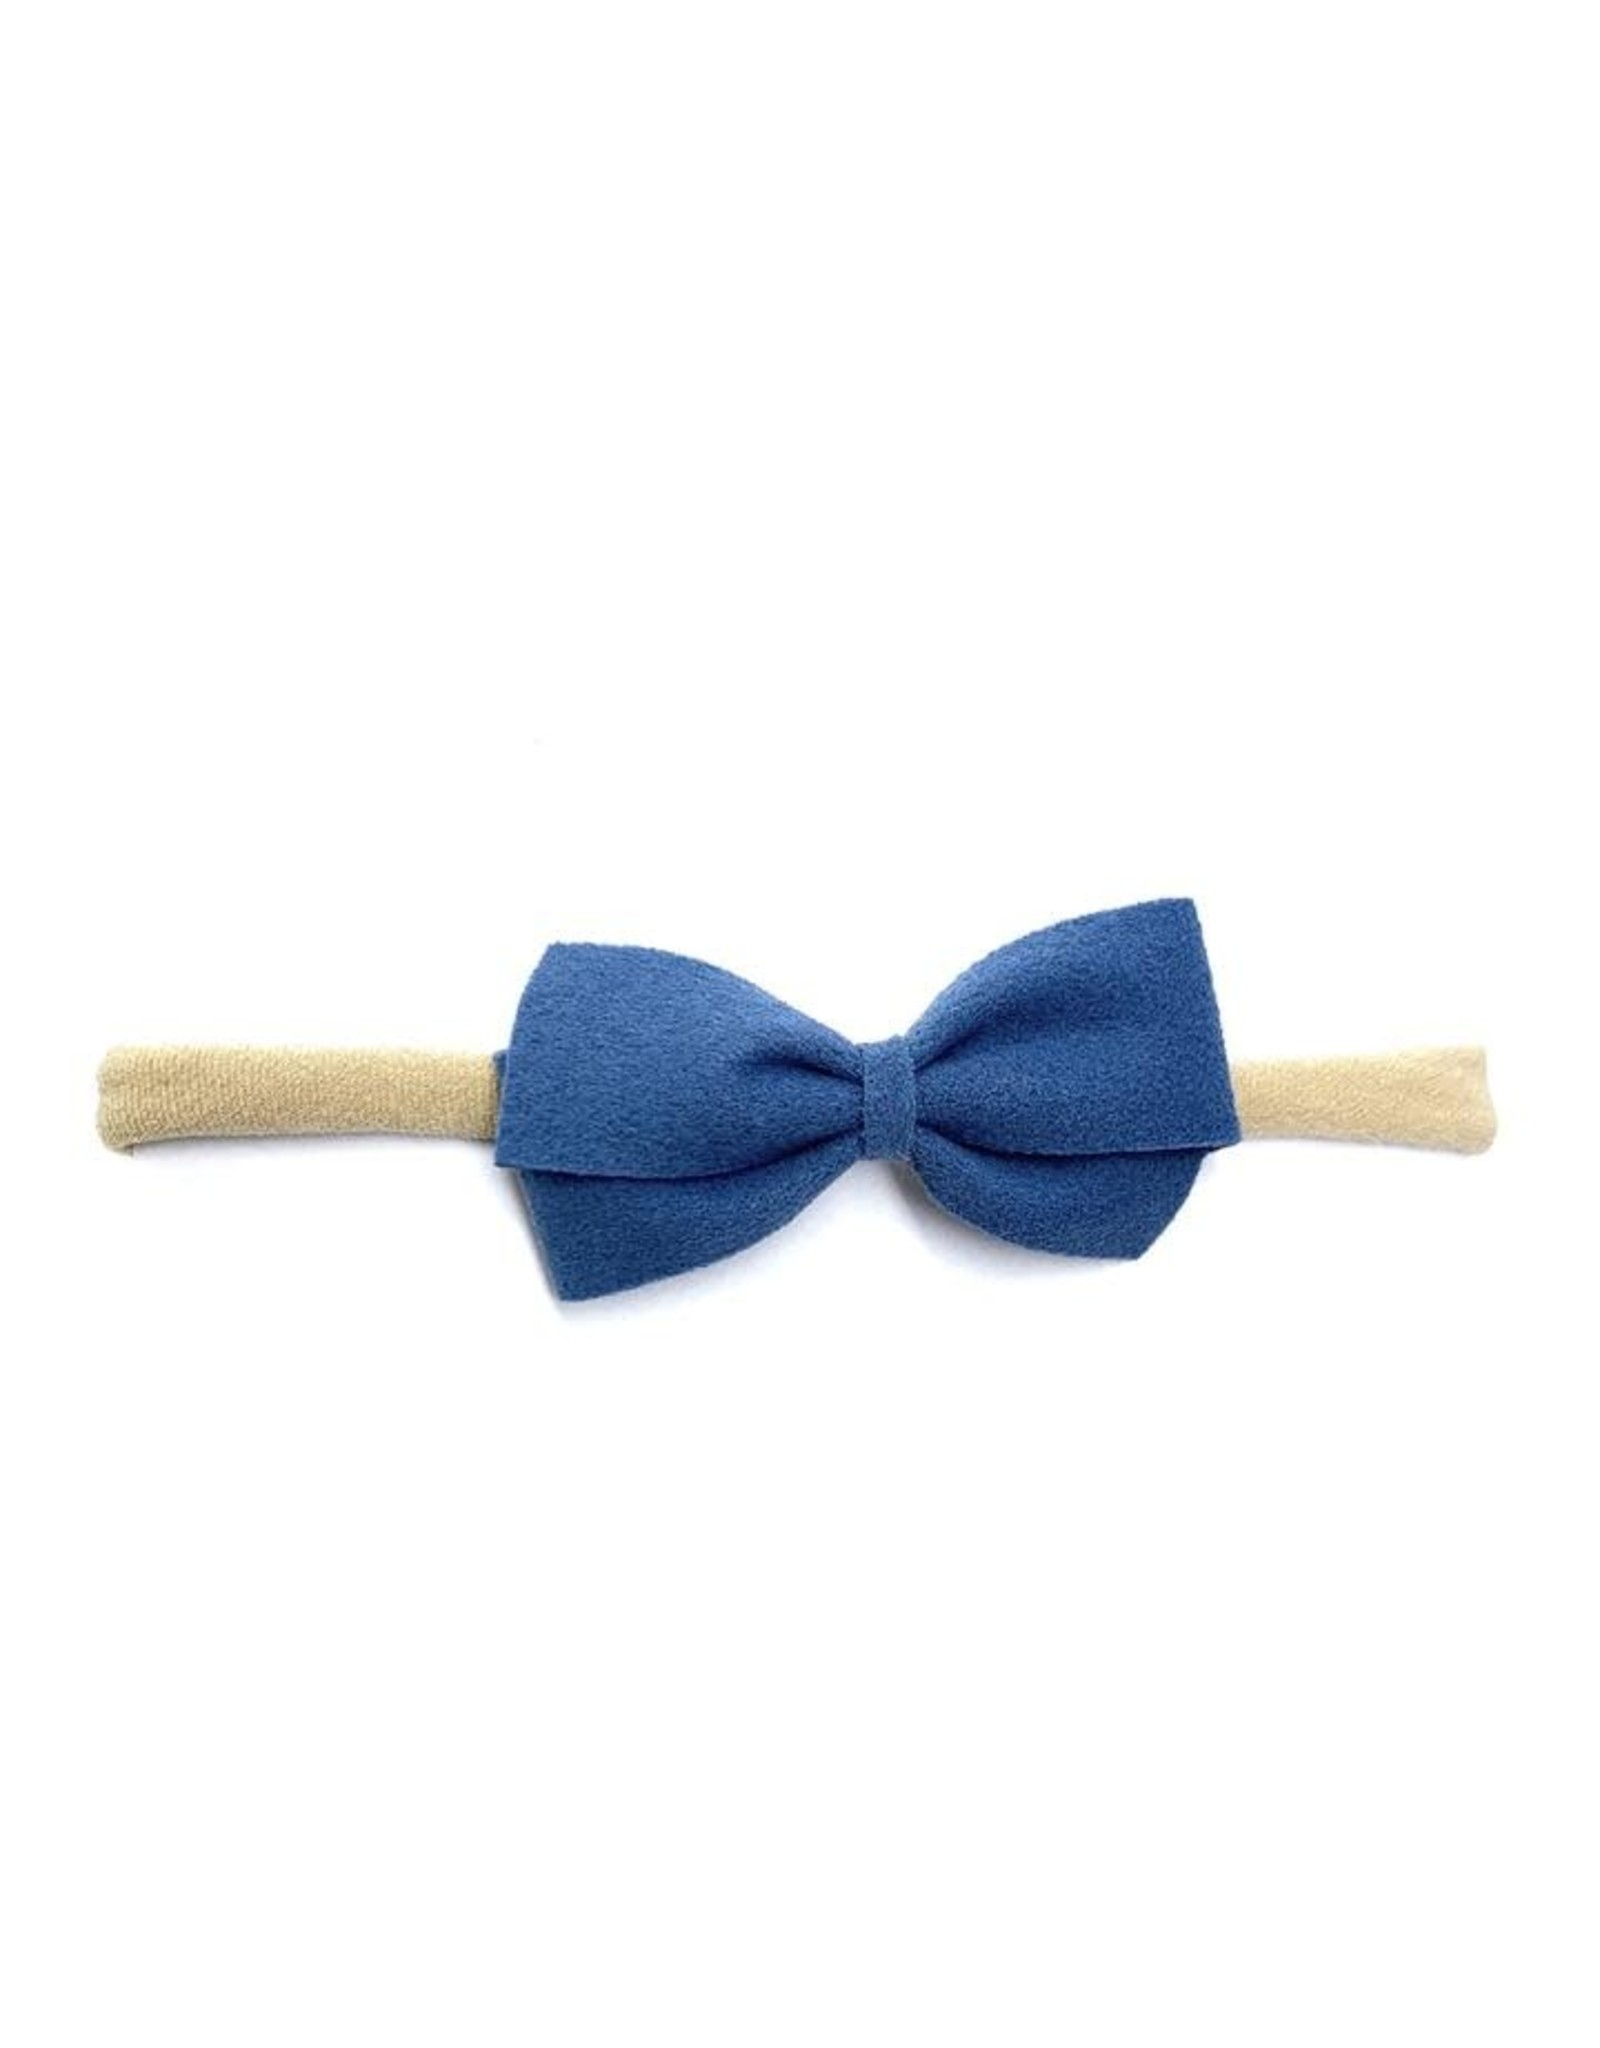 Baby Wisp Baby Wisp Thali Faux Suede Bow Headband, Smoke Blue